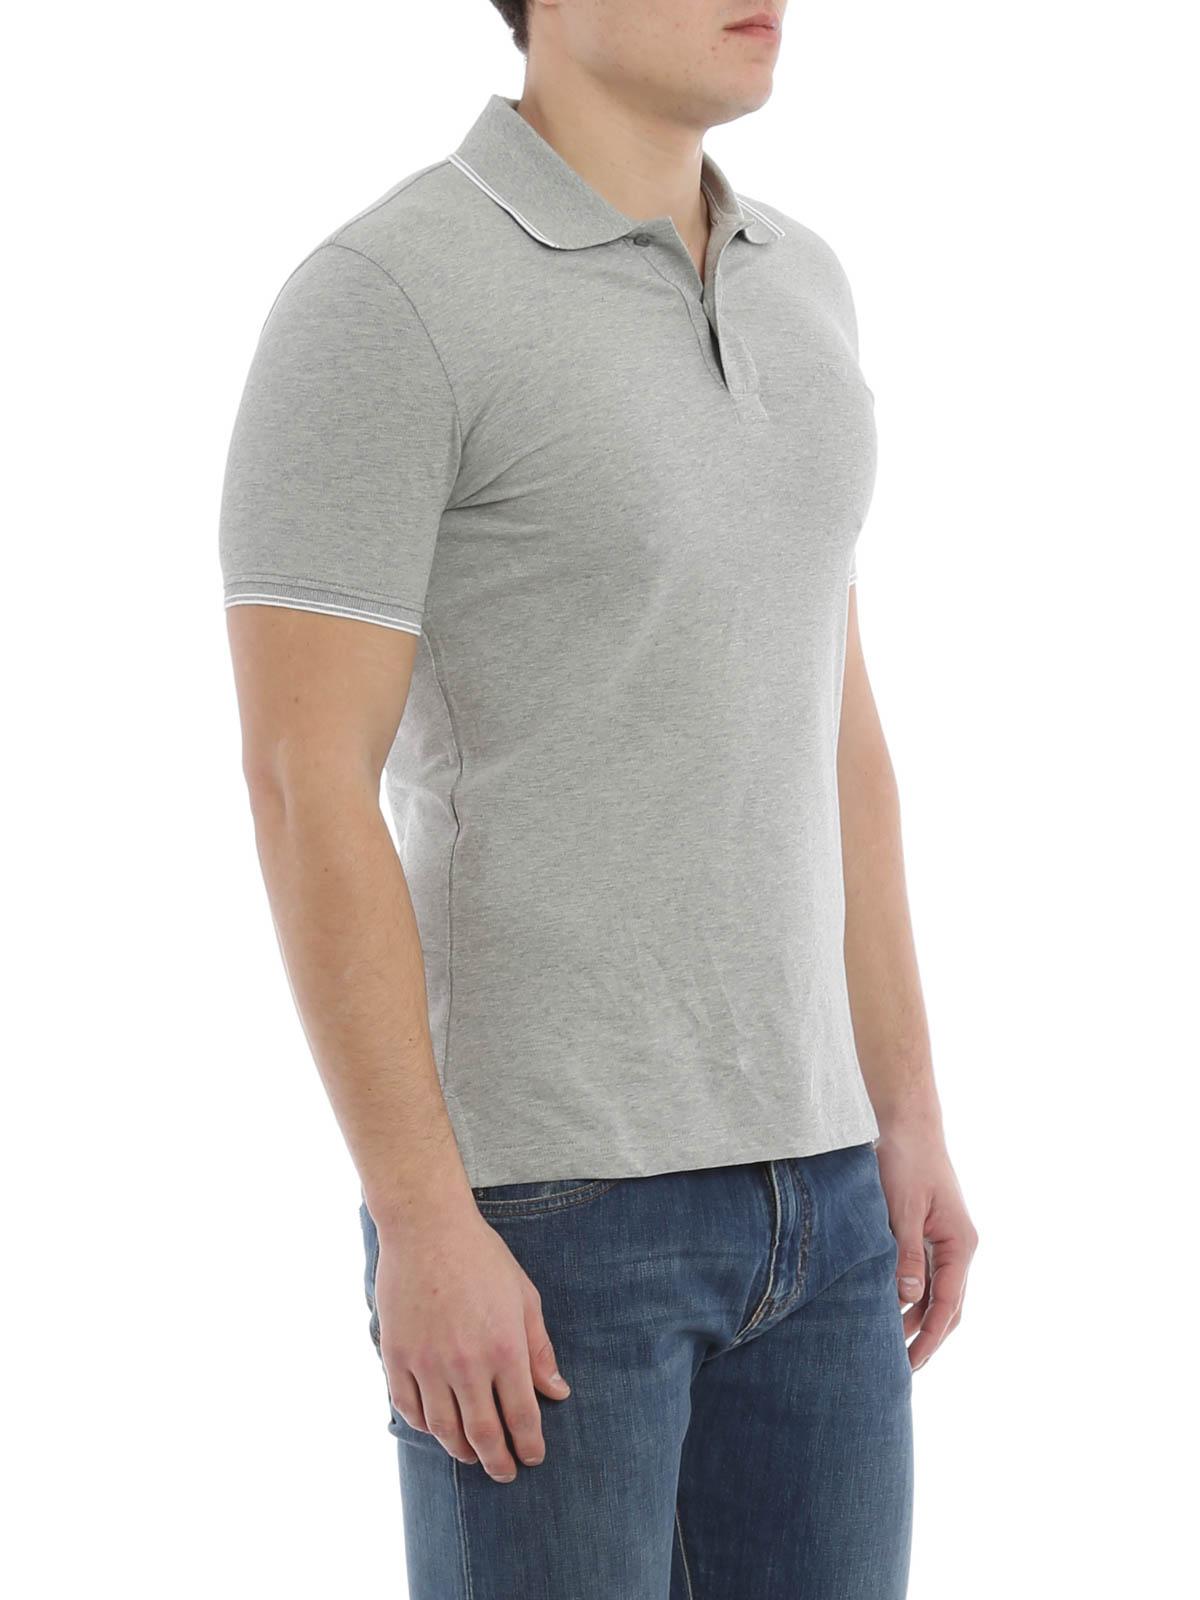 Aj polo shirt by armani jeans polo shirts ikrix for Polo shirt and jeans